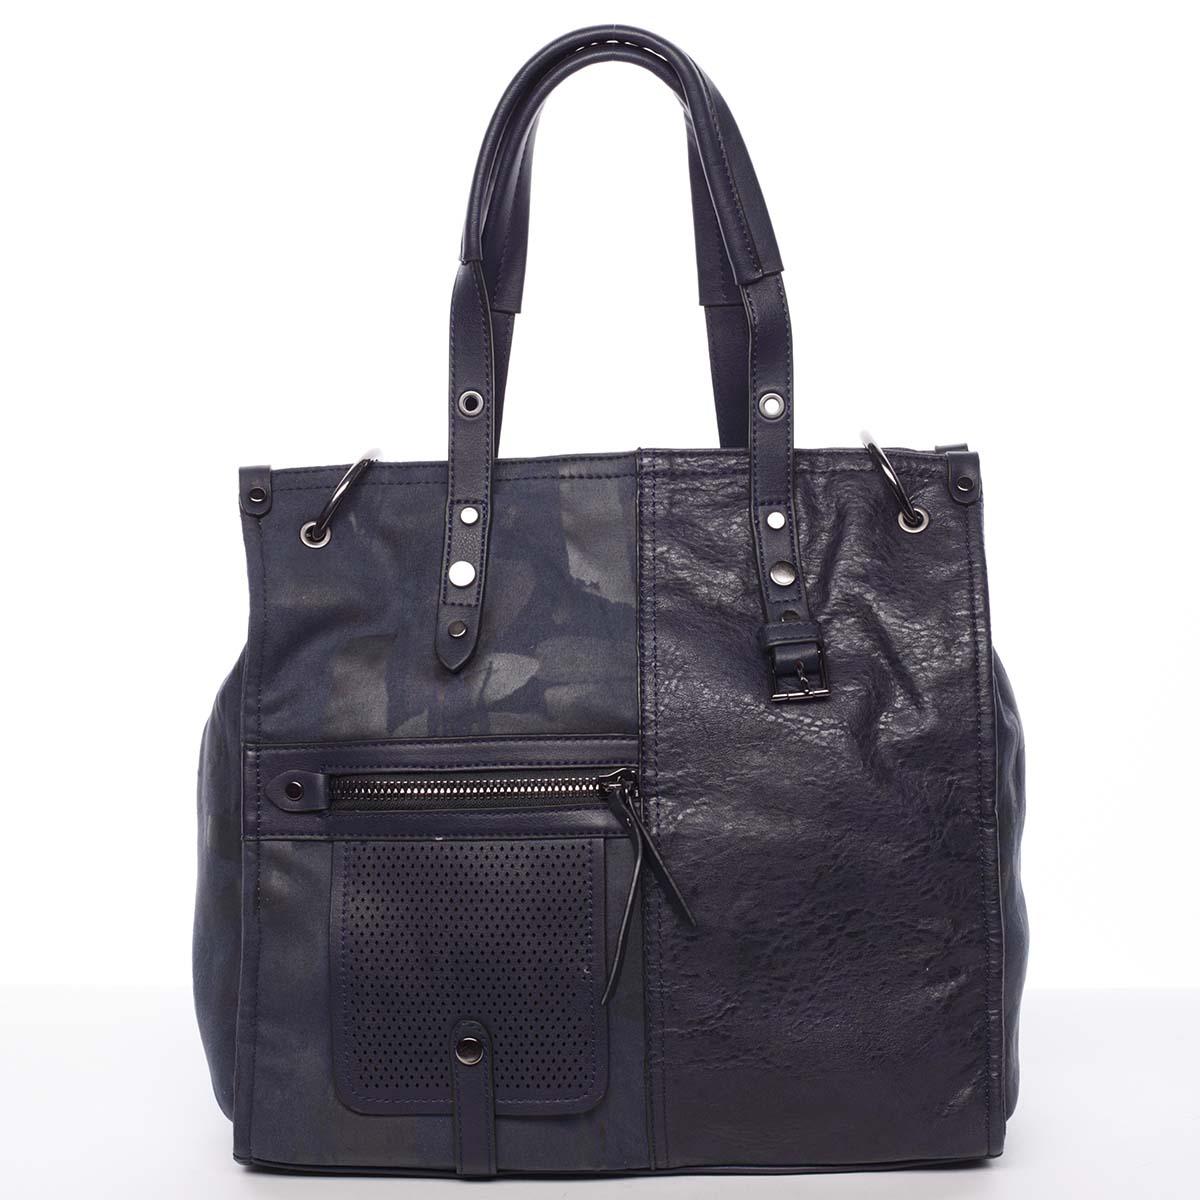 Nadčasová dámska kabelka do ruky modrá - MARIA C Jemma